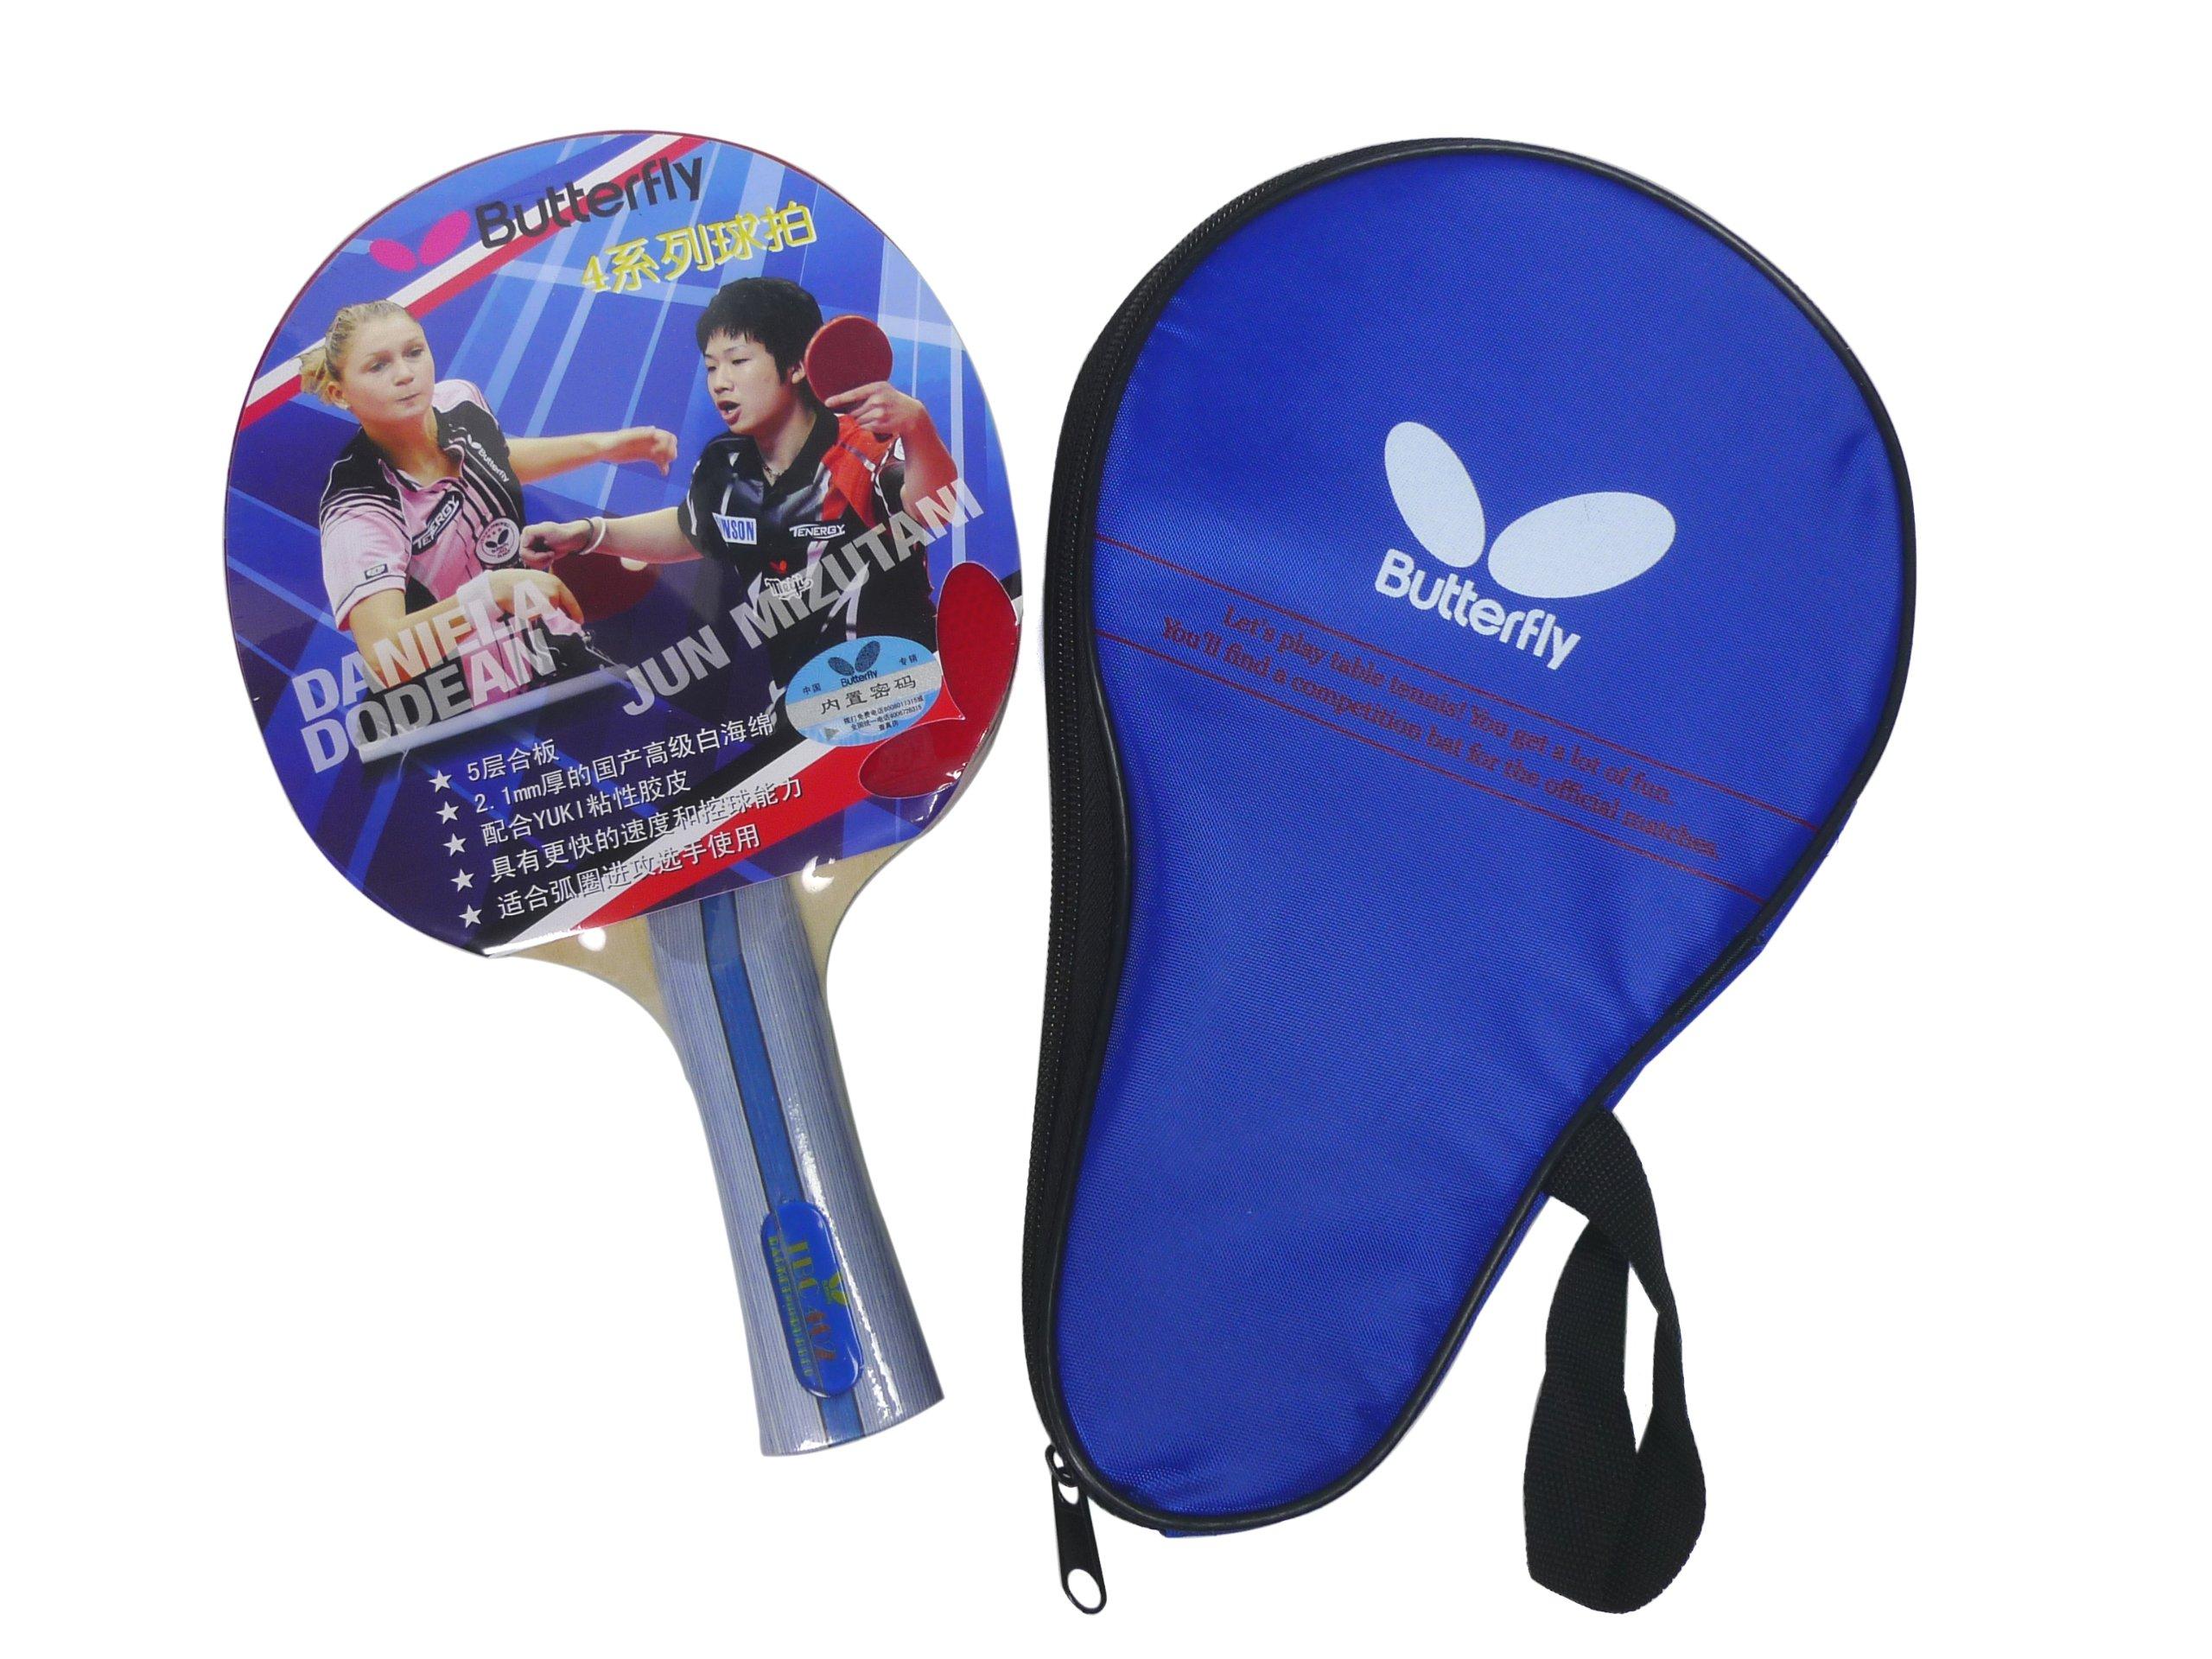 4adc2634f42 Galleon - Butterfly TBC 402 FL Shakehand Yuki Rubber Table Tennis Racket  Ping Pong Bat